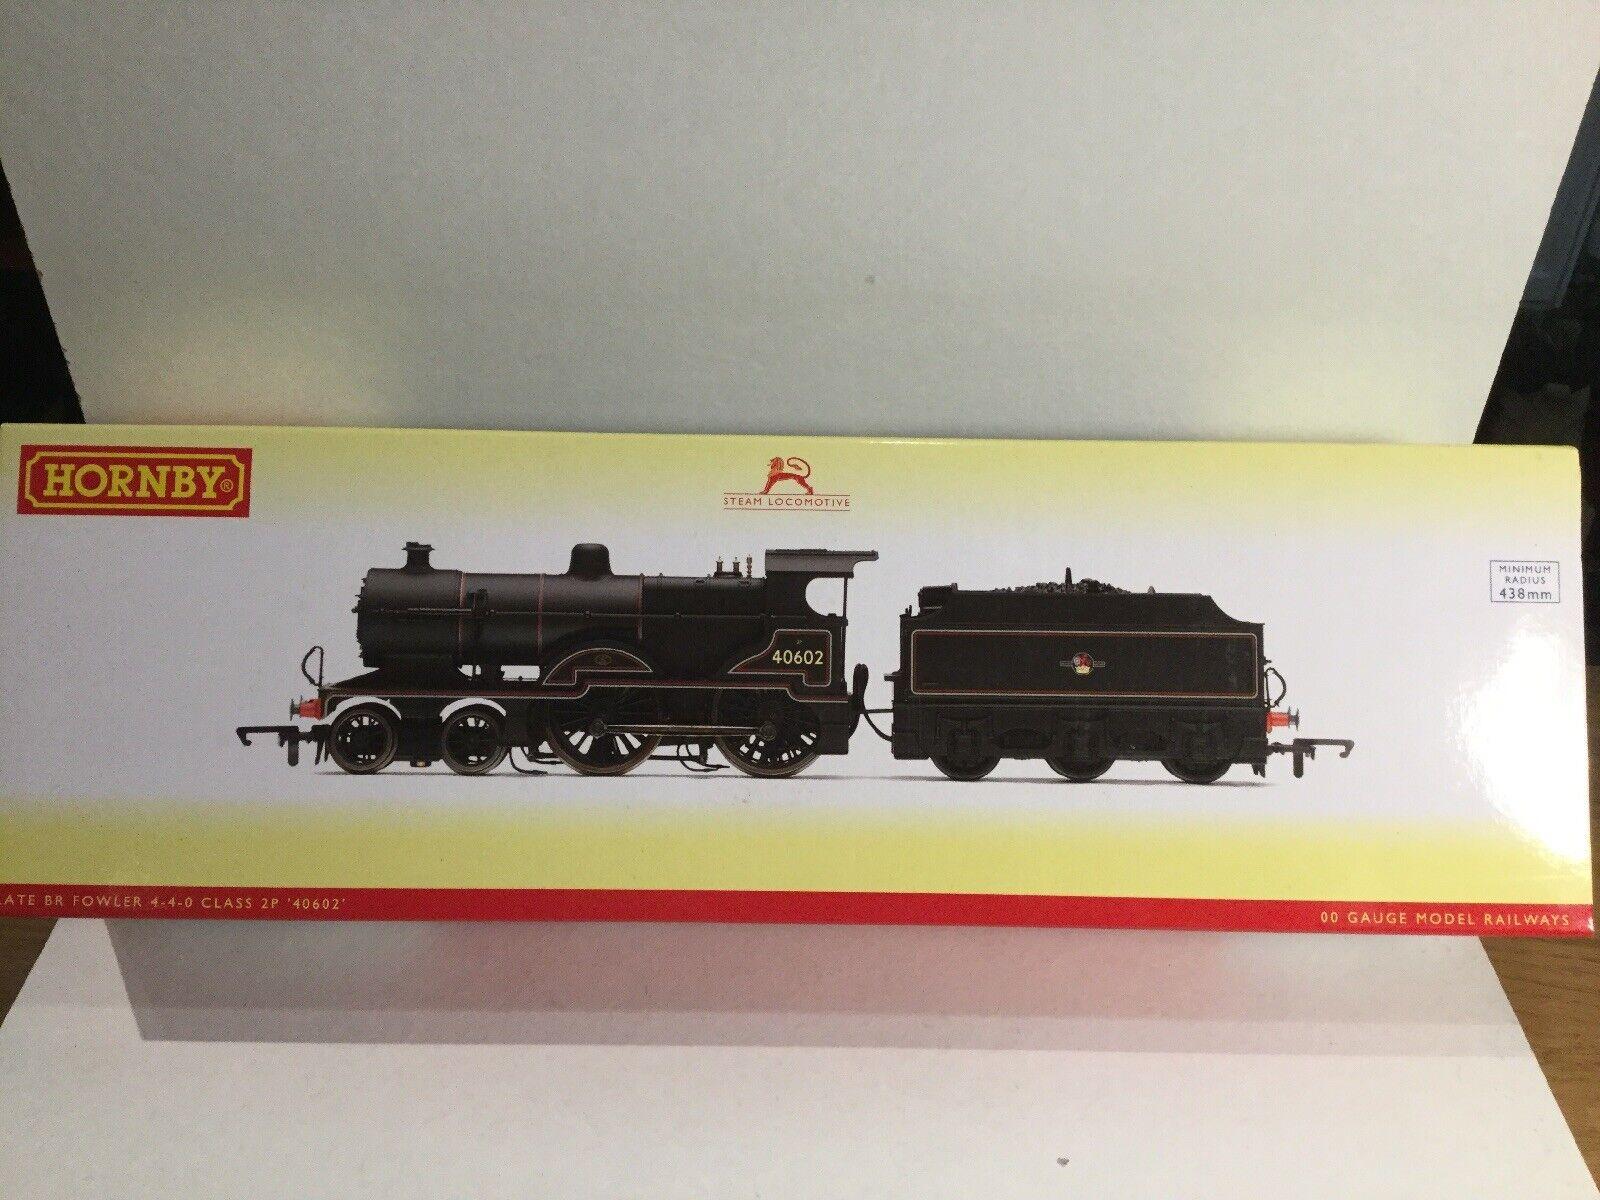 Hornby OO Gauge R3315 BR (late) 4-4-0 Class 2P Fowler 40602 Locomotive 00 Gauge